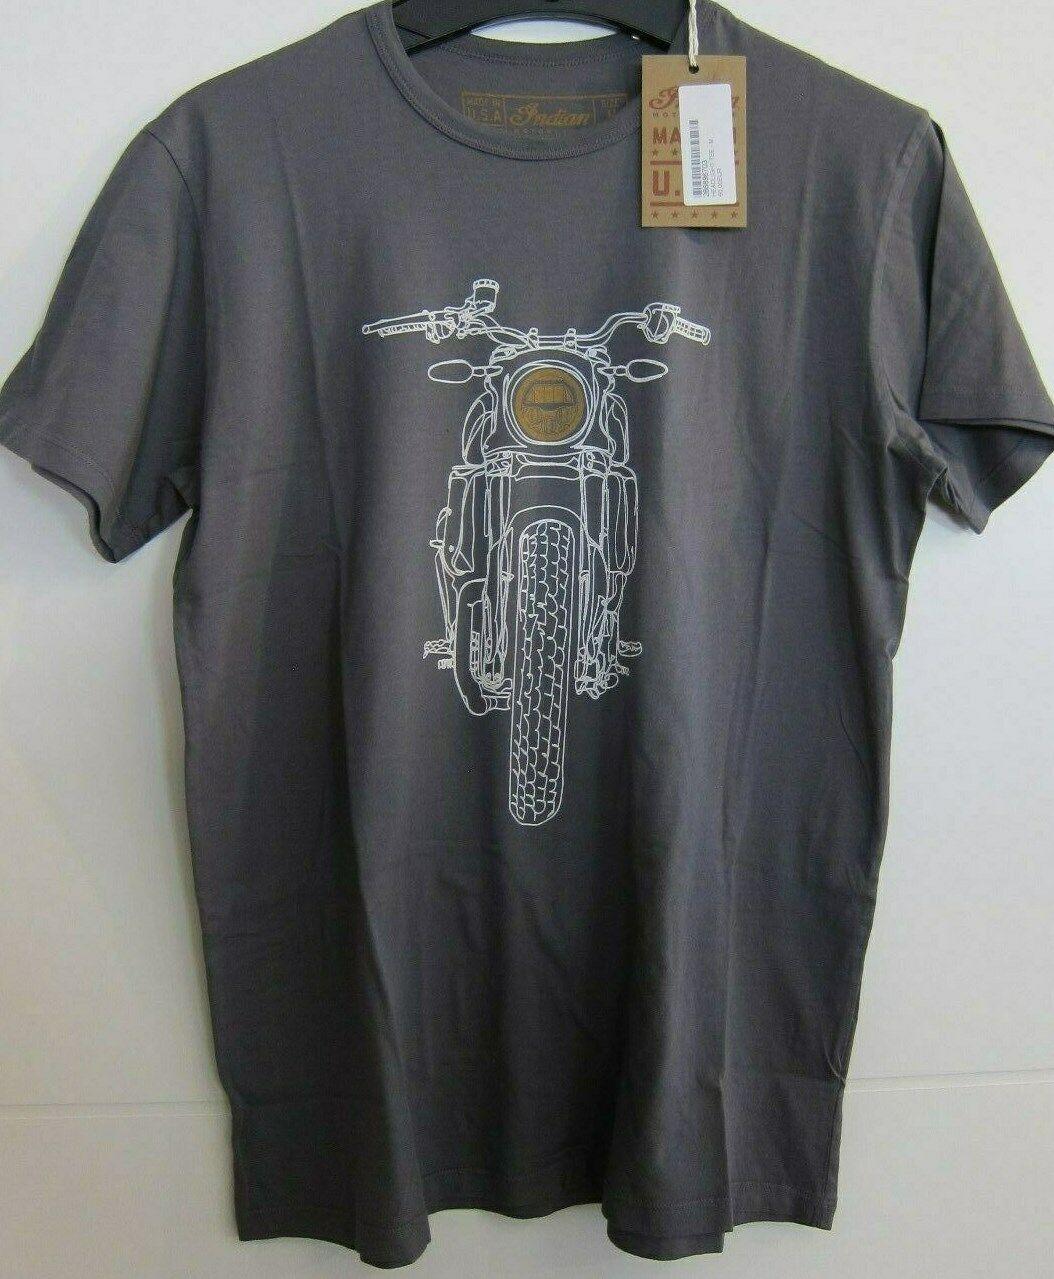 Indian Motorcycle Shirt T-Shirt grau Indian Scout Bobber NEW  286896703 Größe M